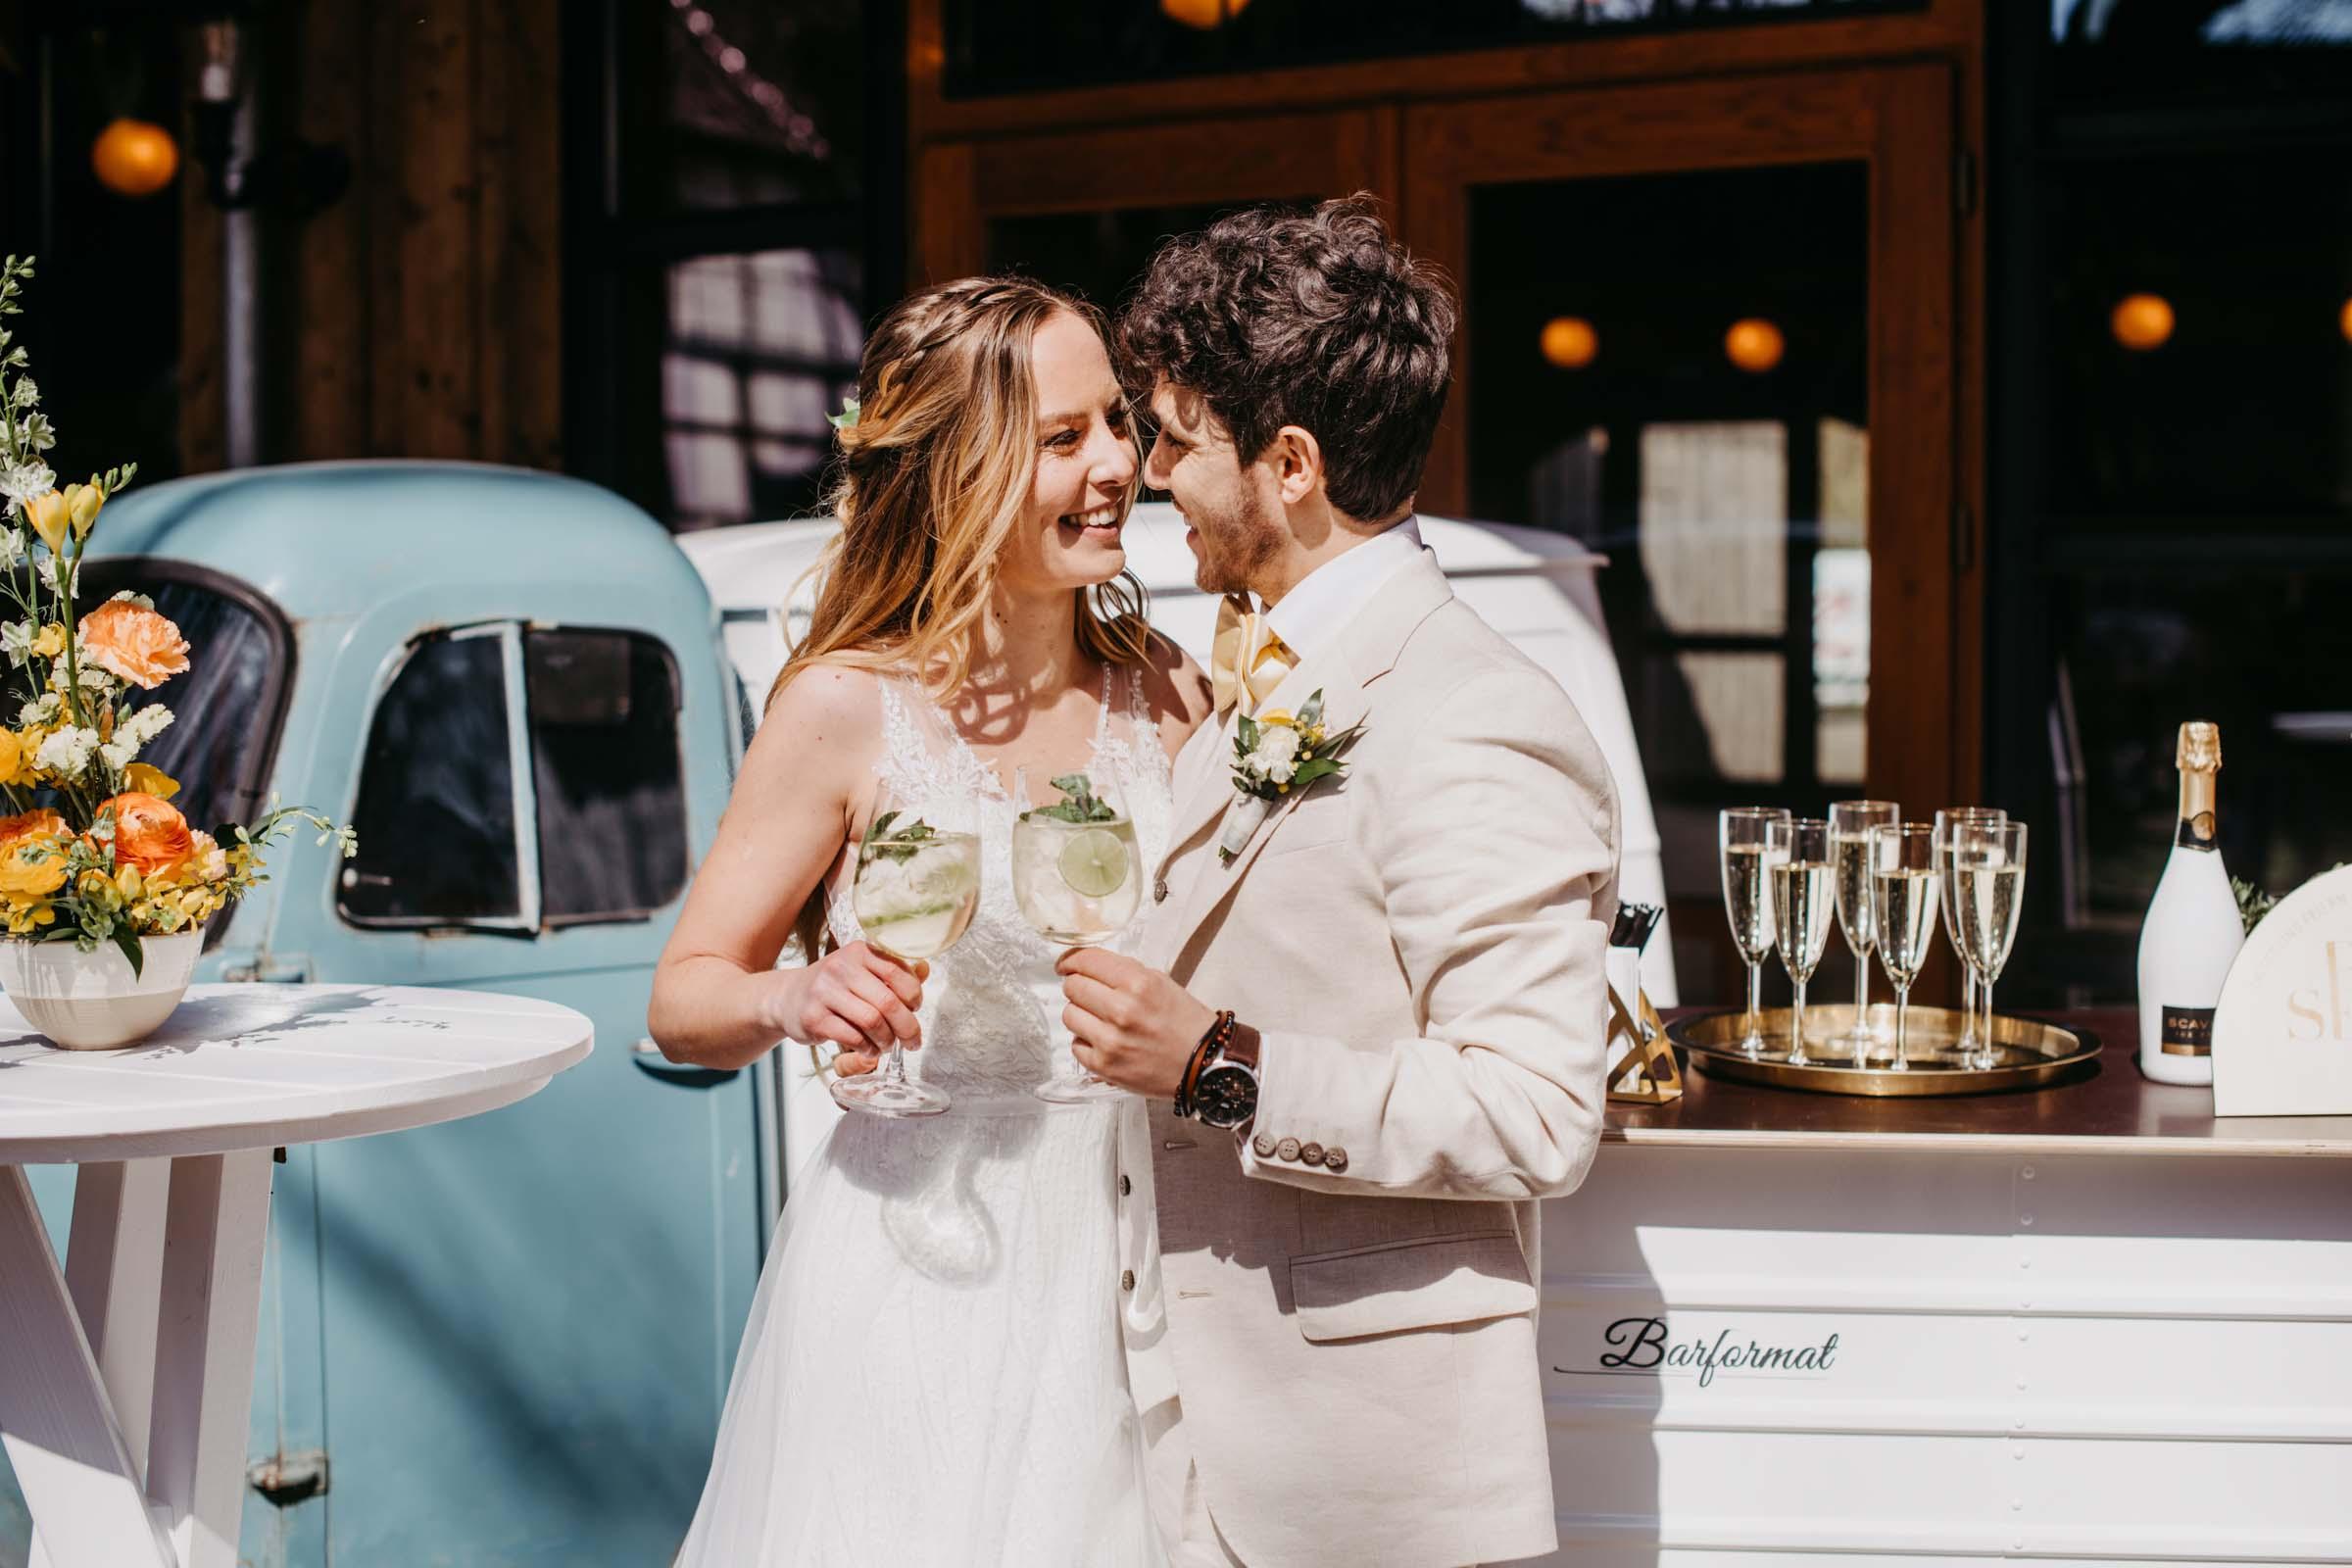 Mobile | Bar | VW | Bulli | Ape | Vespa | Cocktailservice | Cocktail | Bus | Catering | Getränke | Foodtruck | Sektempfang | Standesamt | Hochzeit | Barkeeper | Hochzeit | Mieten | Event | Buchen | Barformat